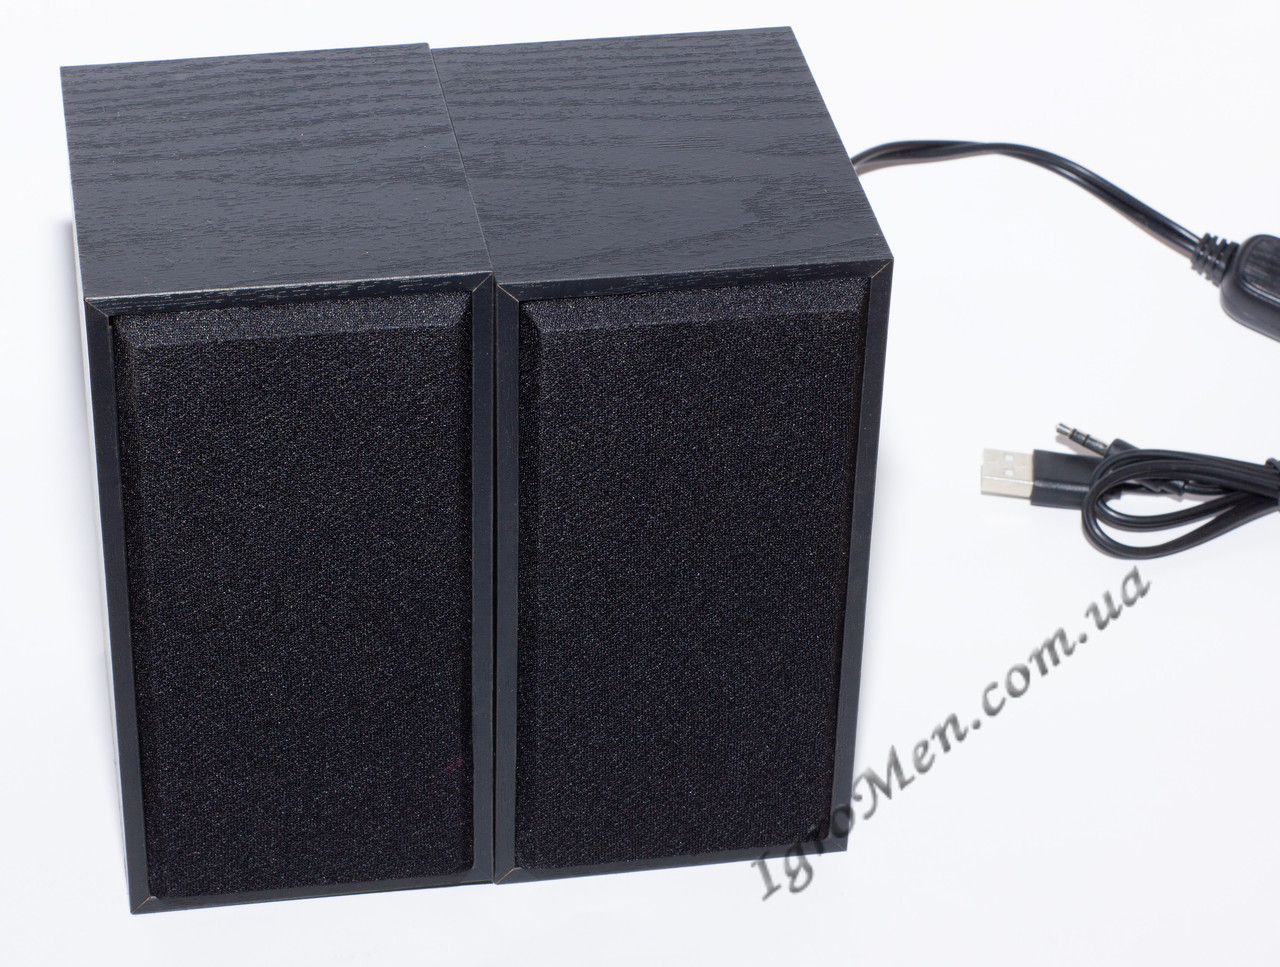 ЮСБ колонки для компьютера, ноутбука (FT101, черн)